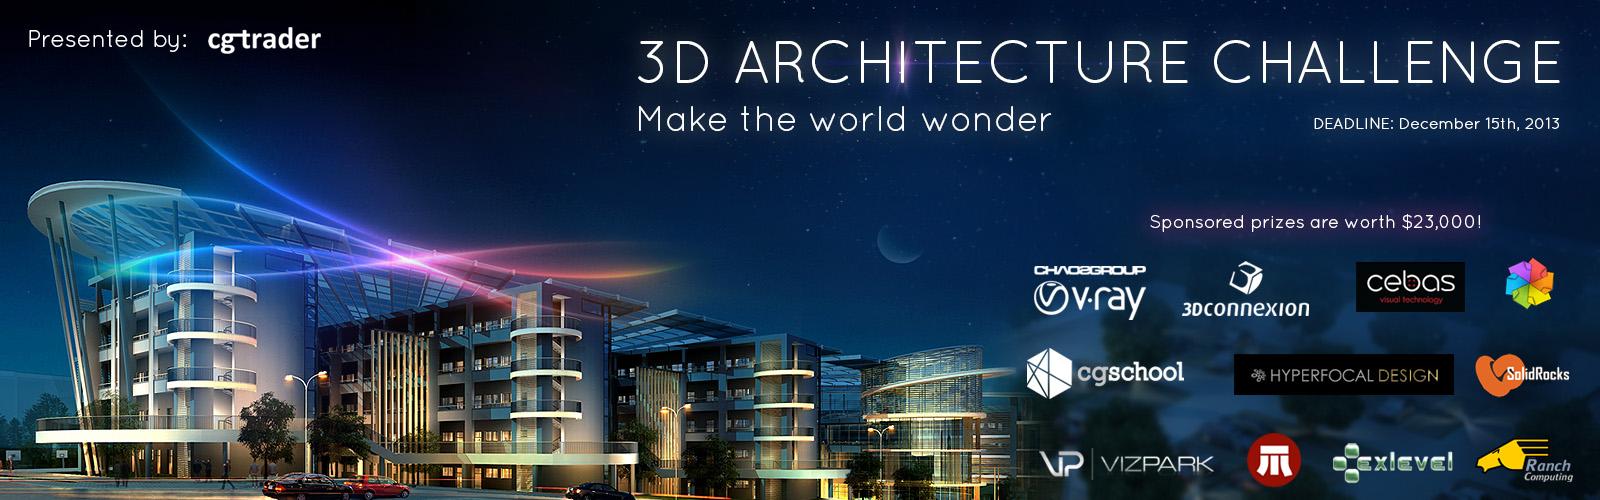 3D Architecture Challenge